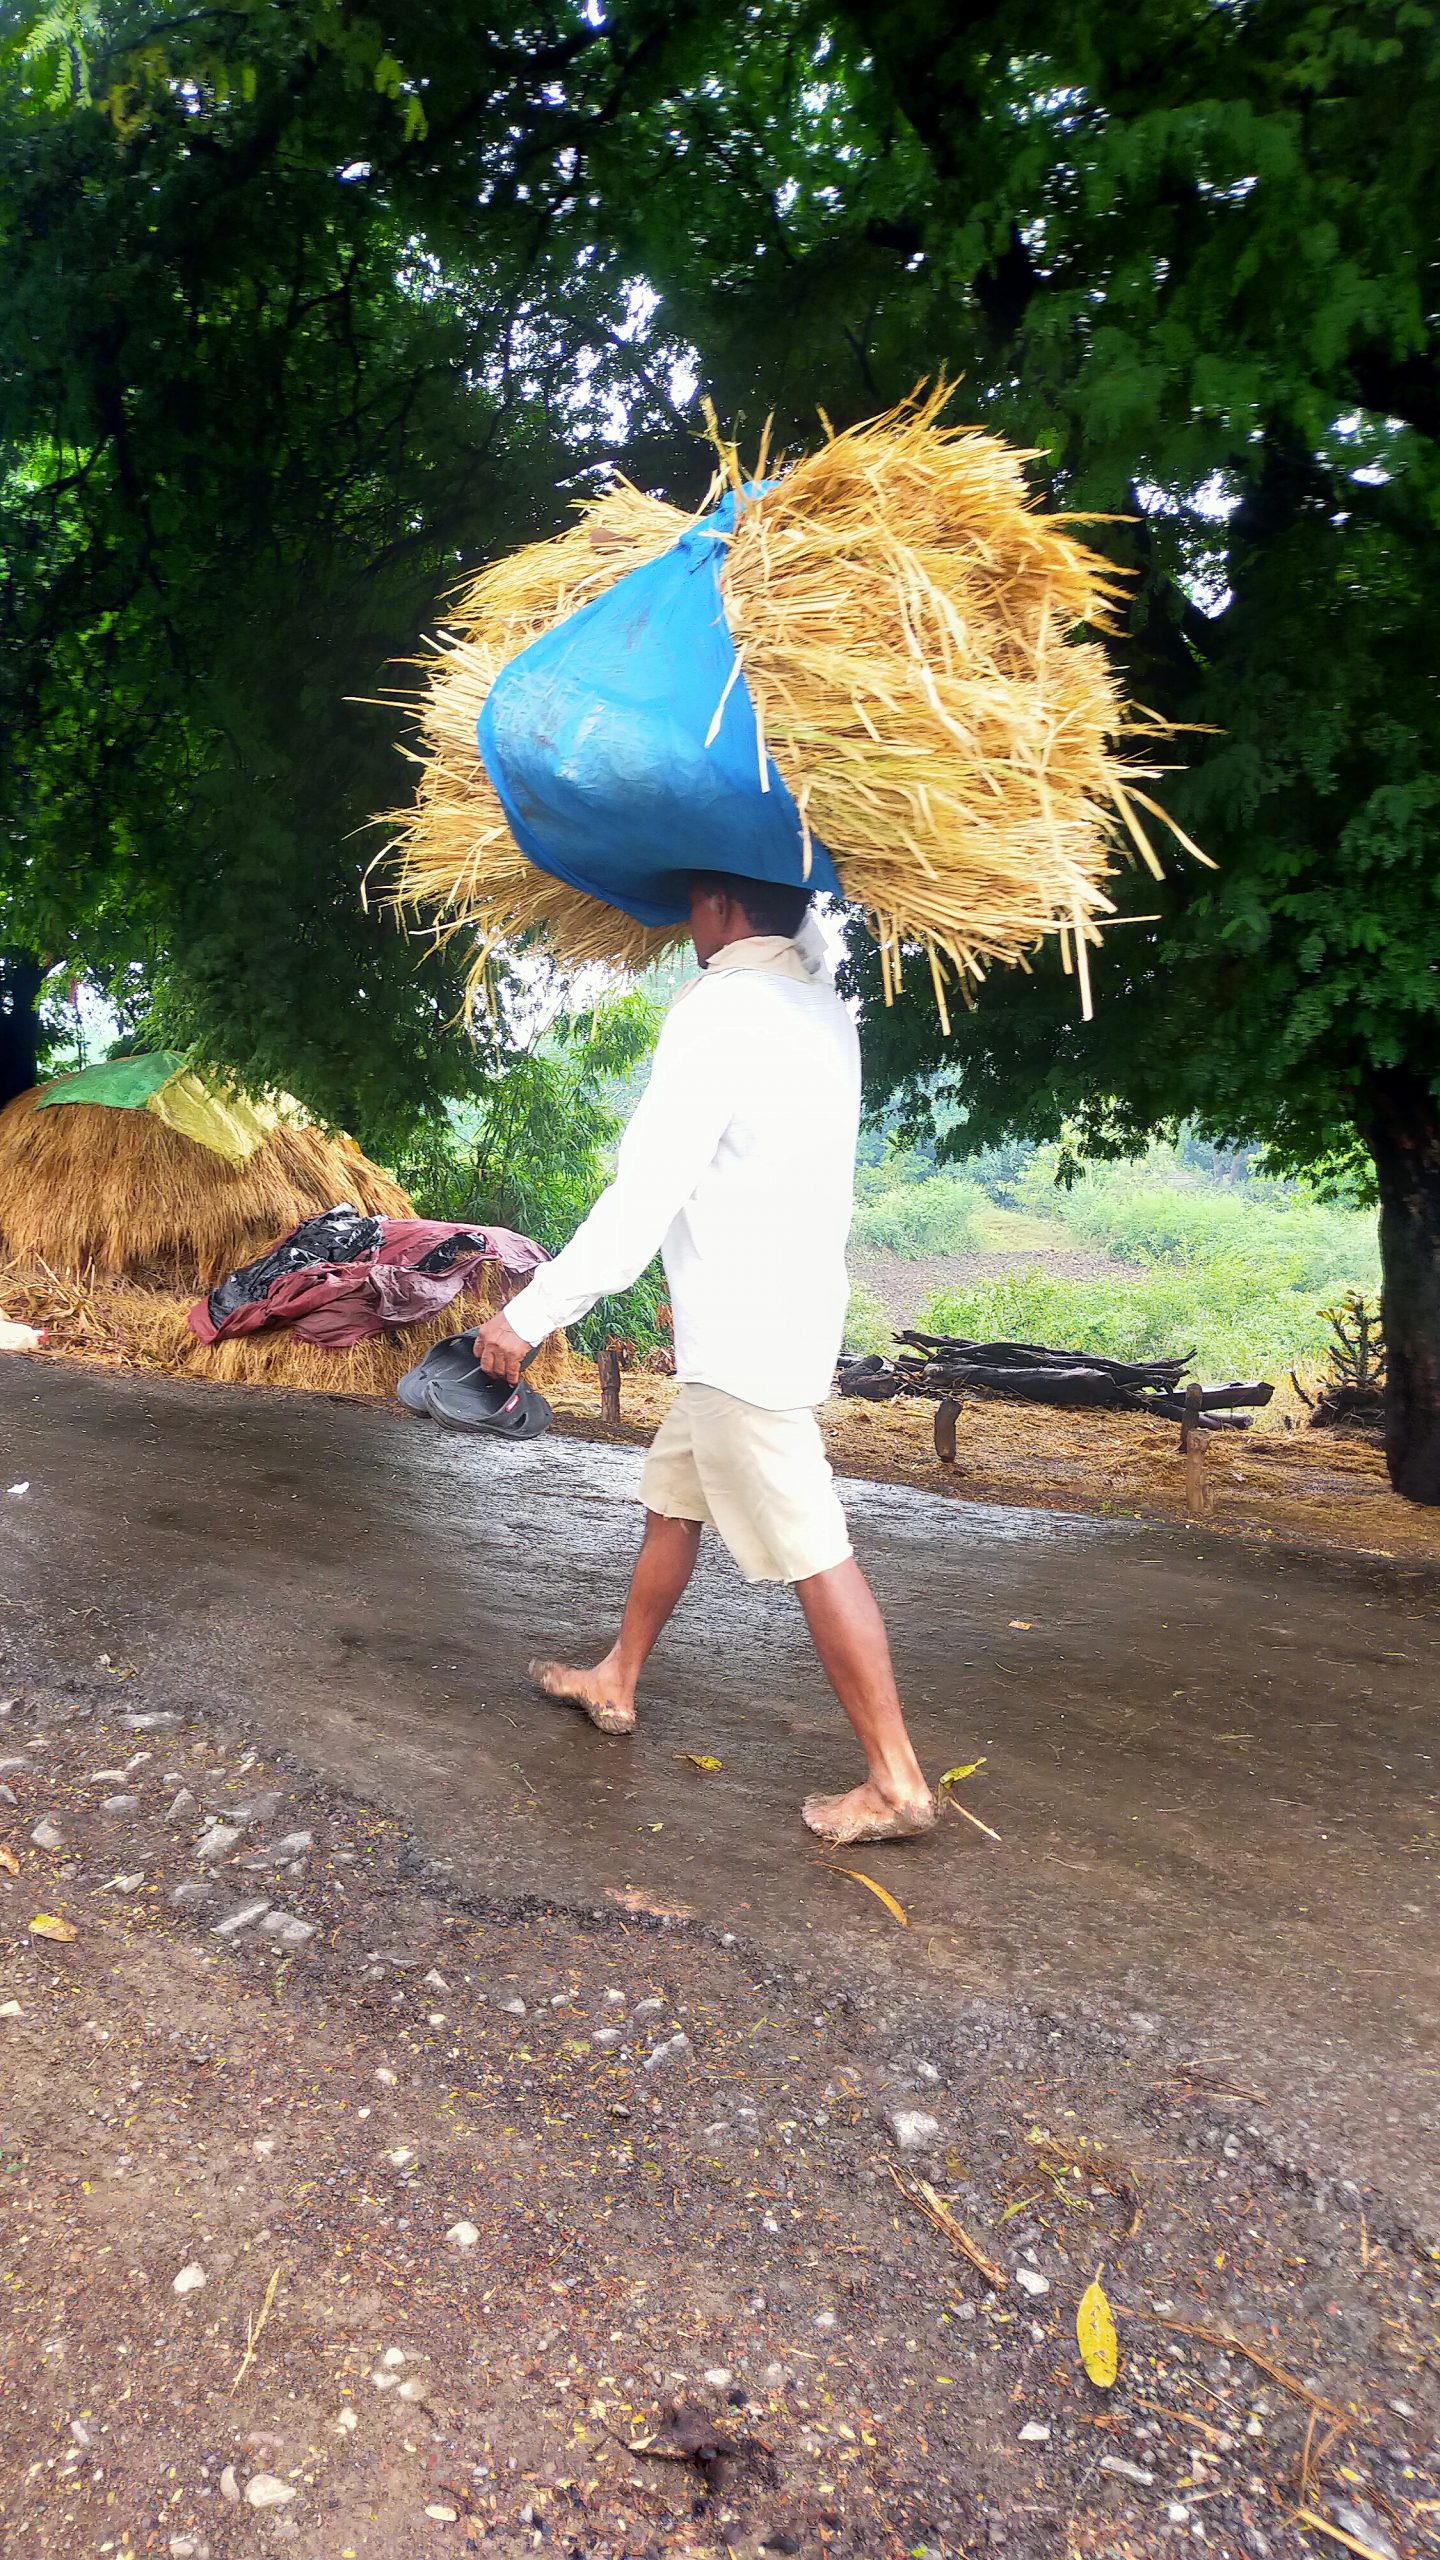 farmer lifting rice straws